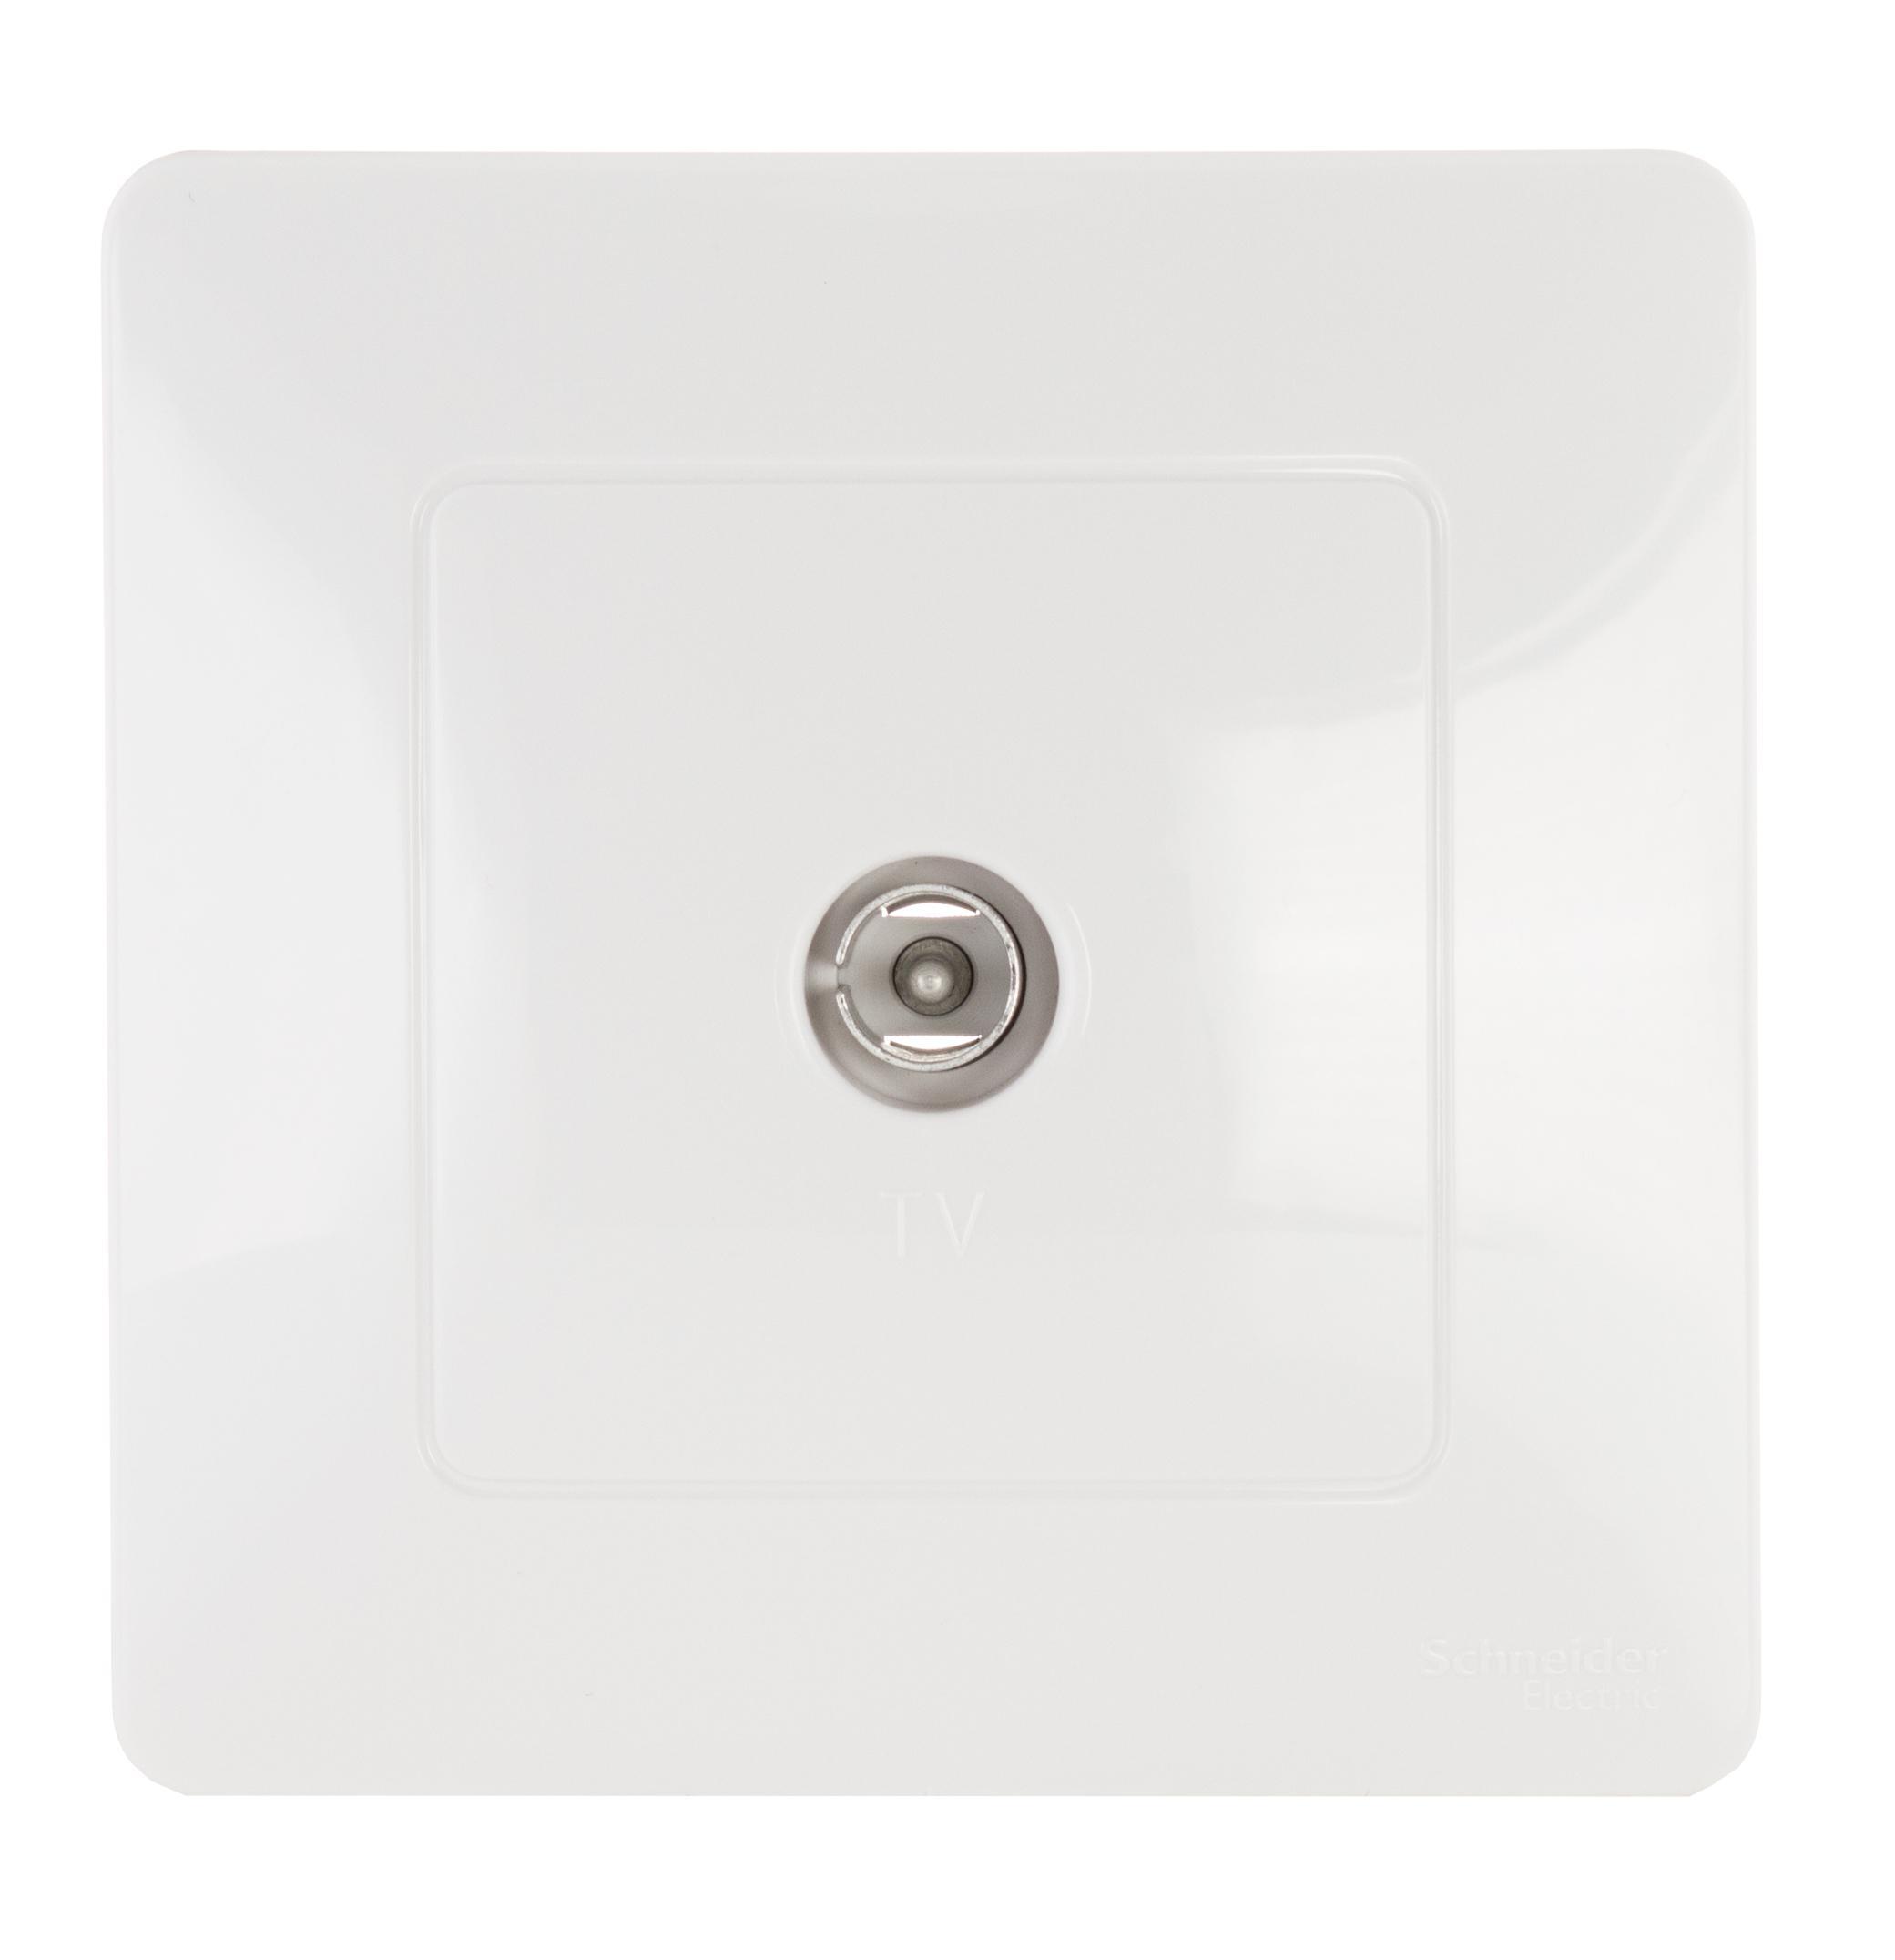 Розетка Schneider electric Blnts000011 blanca  розетка schneider electric se sdn4101121